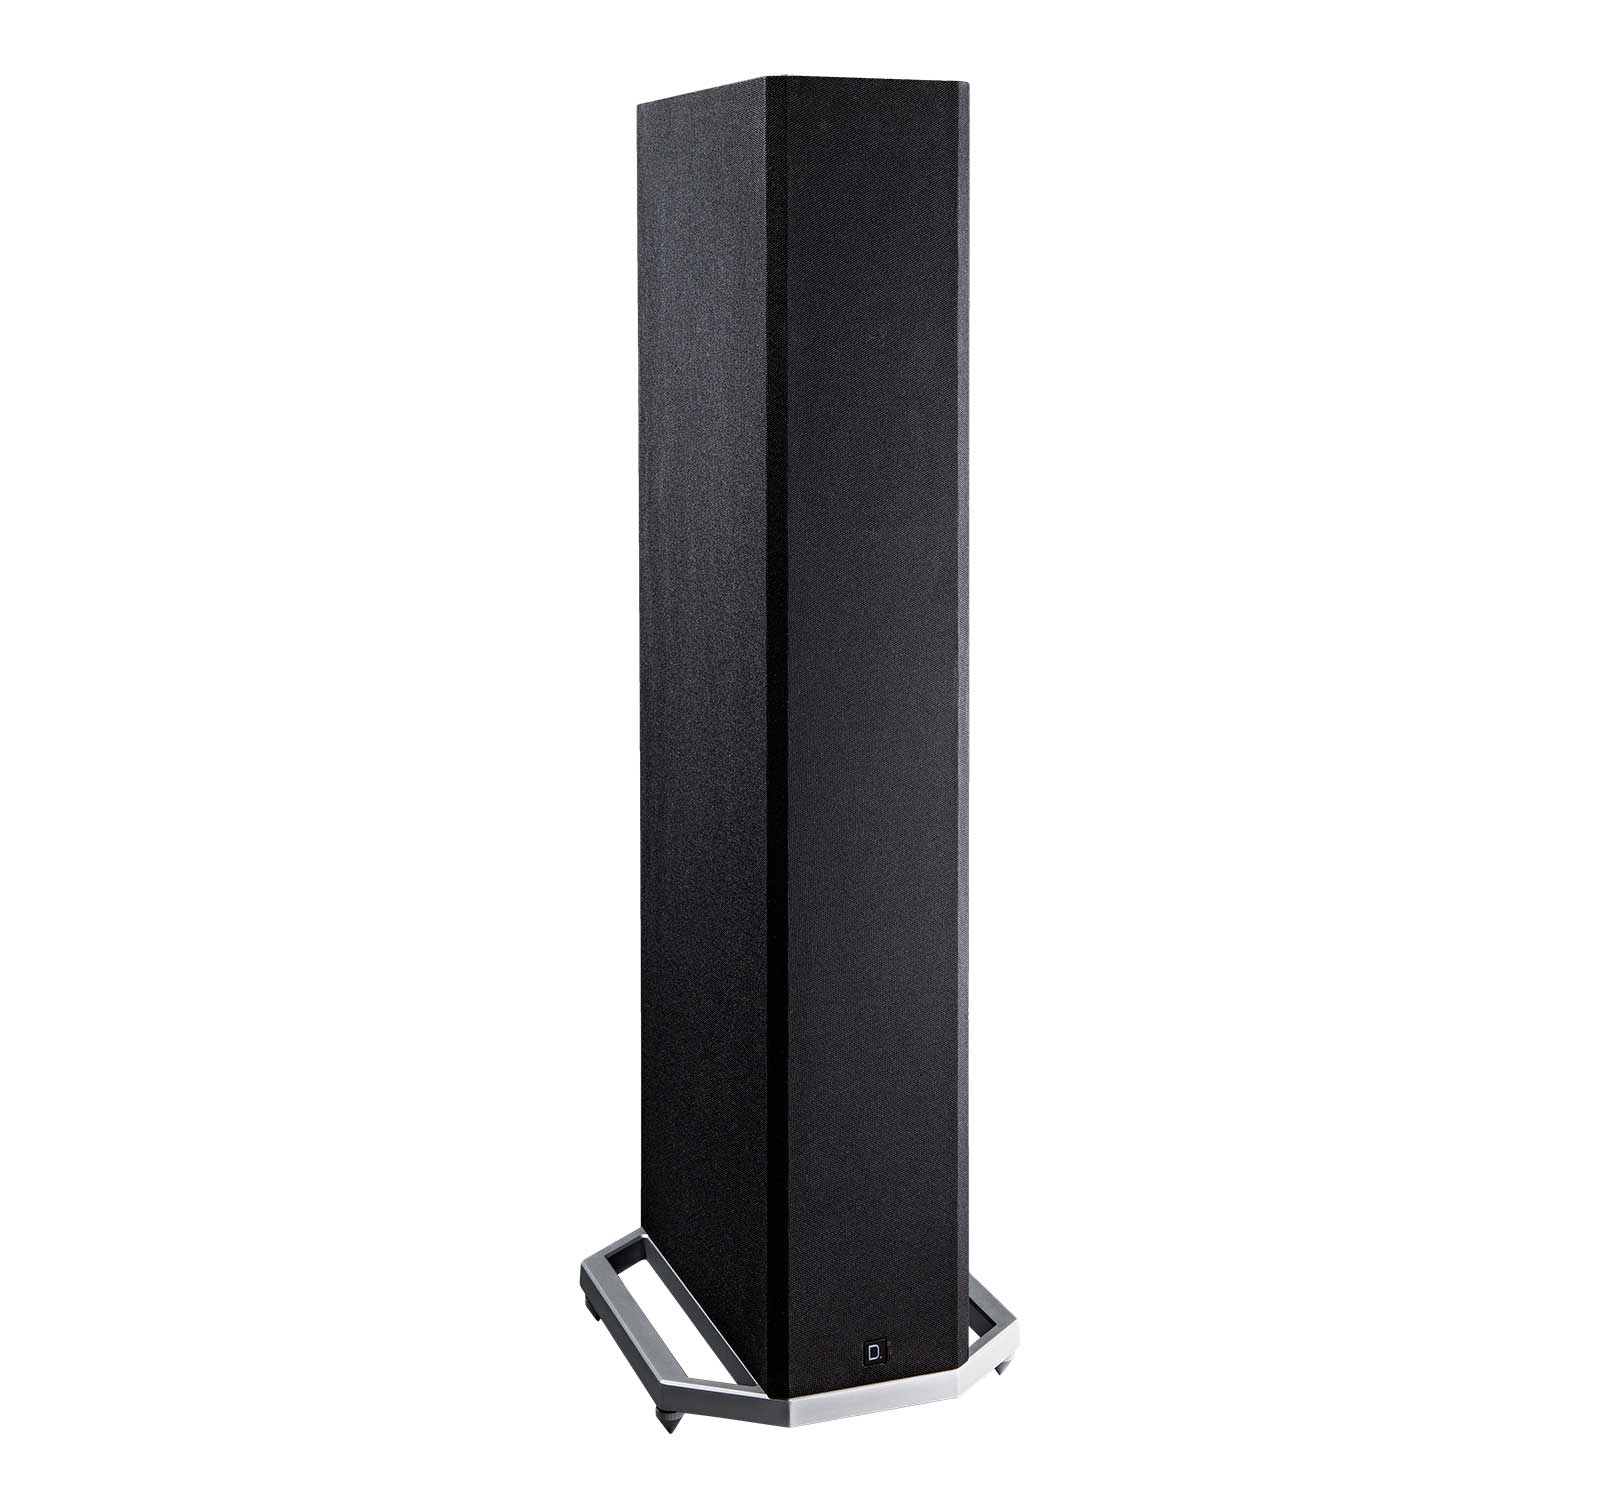 Image of the BP9020 Tower Speaker